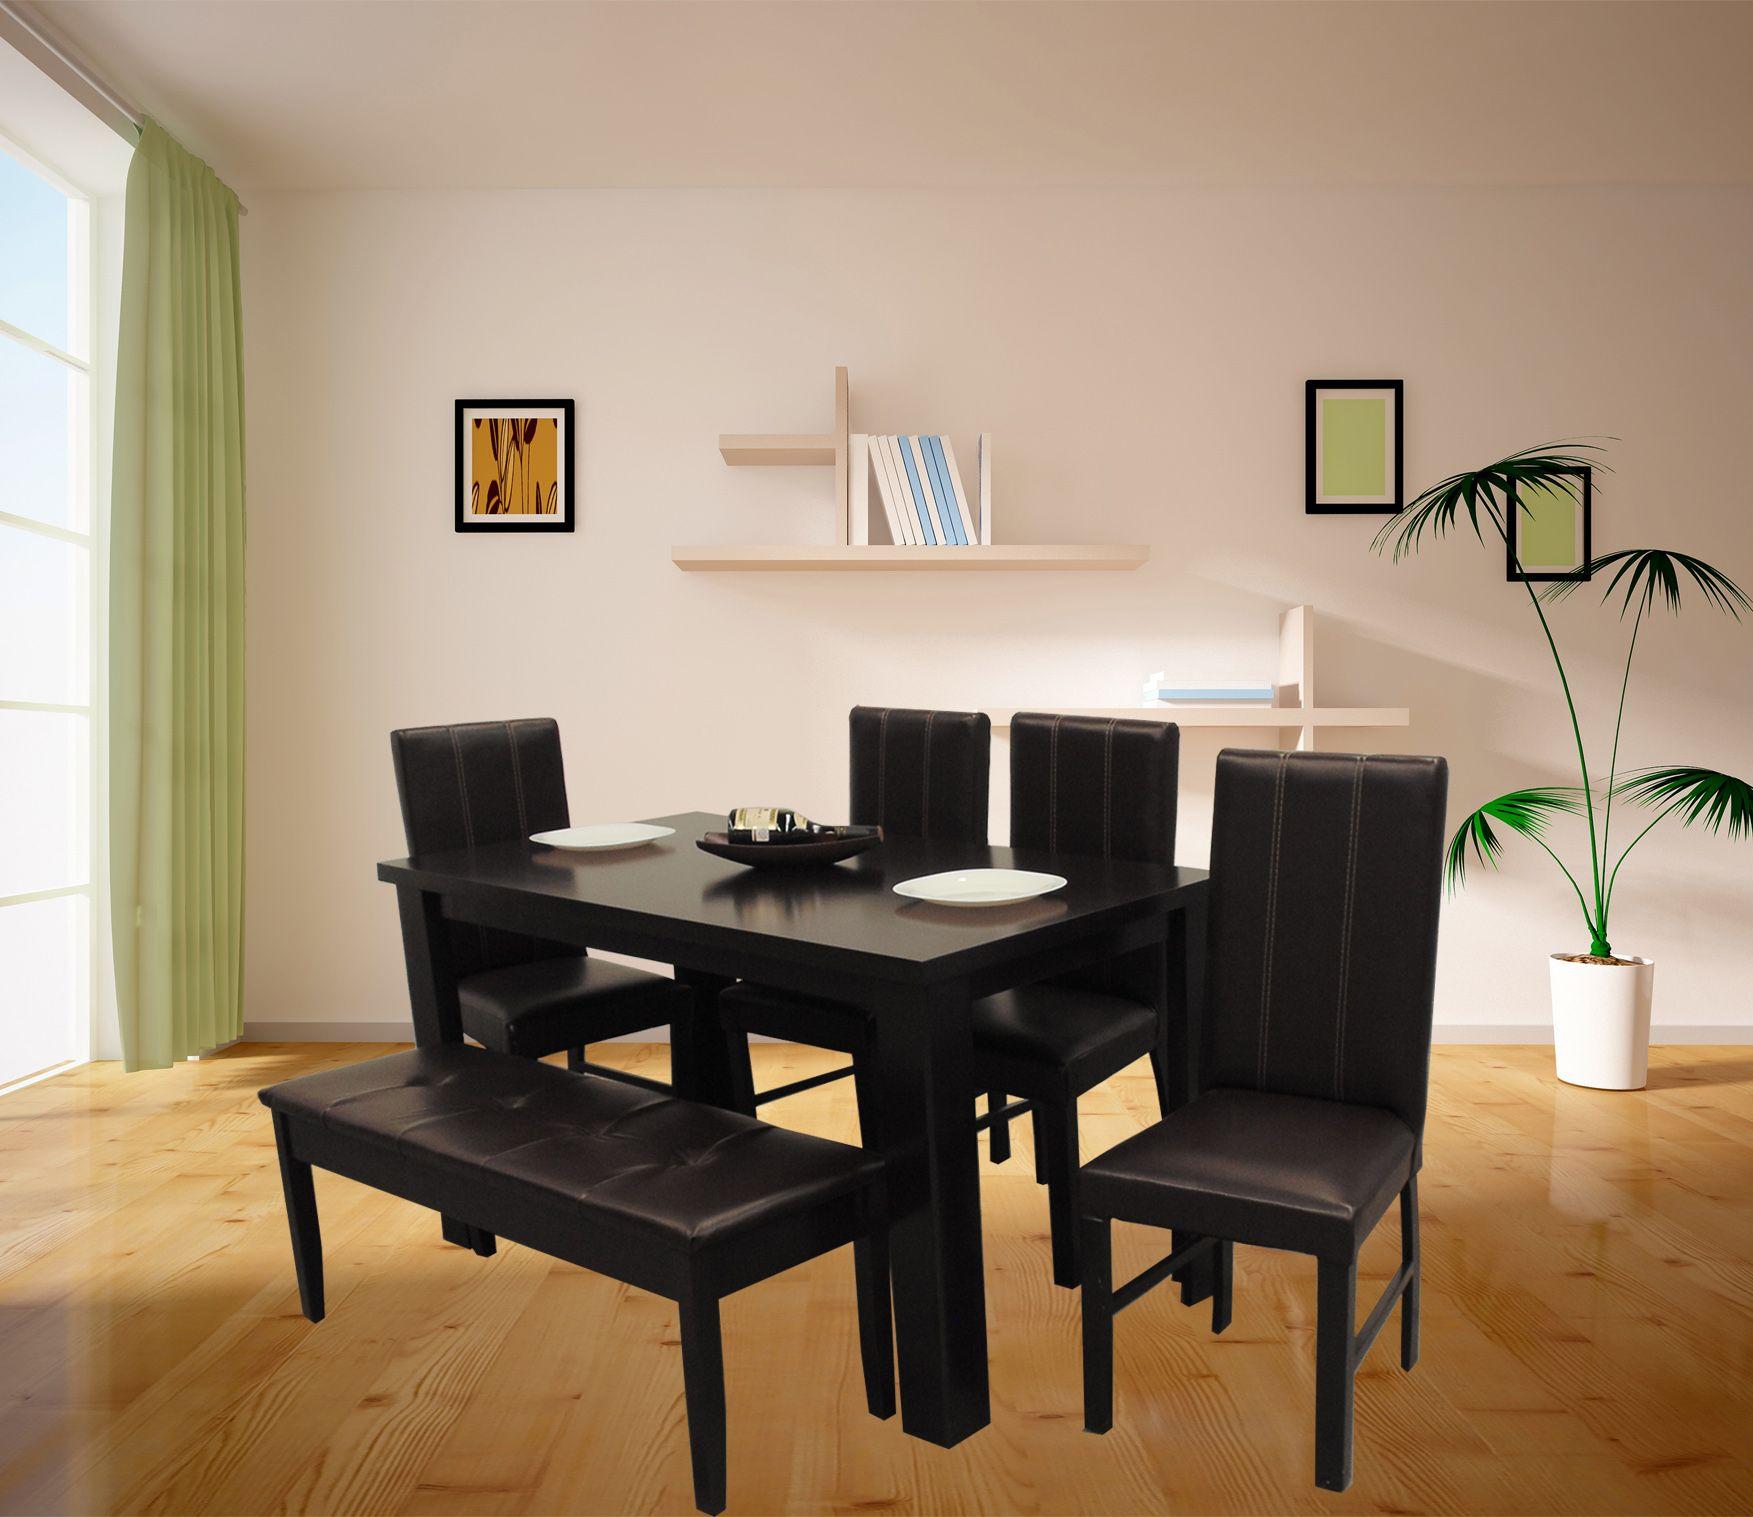 Muebleria Regiomontana Muebles Para El Hogar Sala Pinterest  # Muebles Regiomontanos